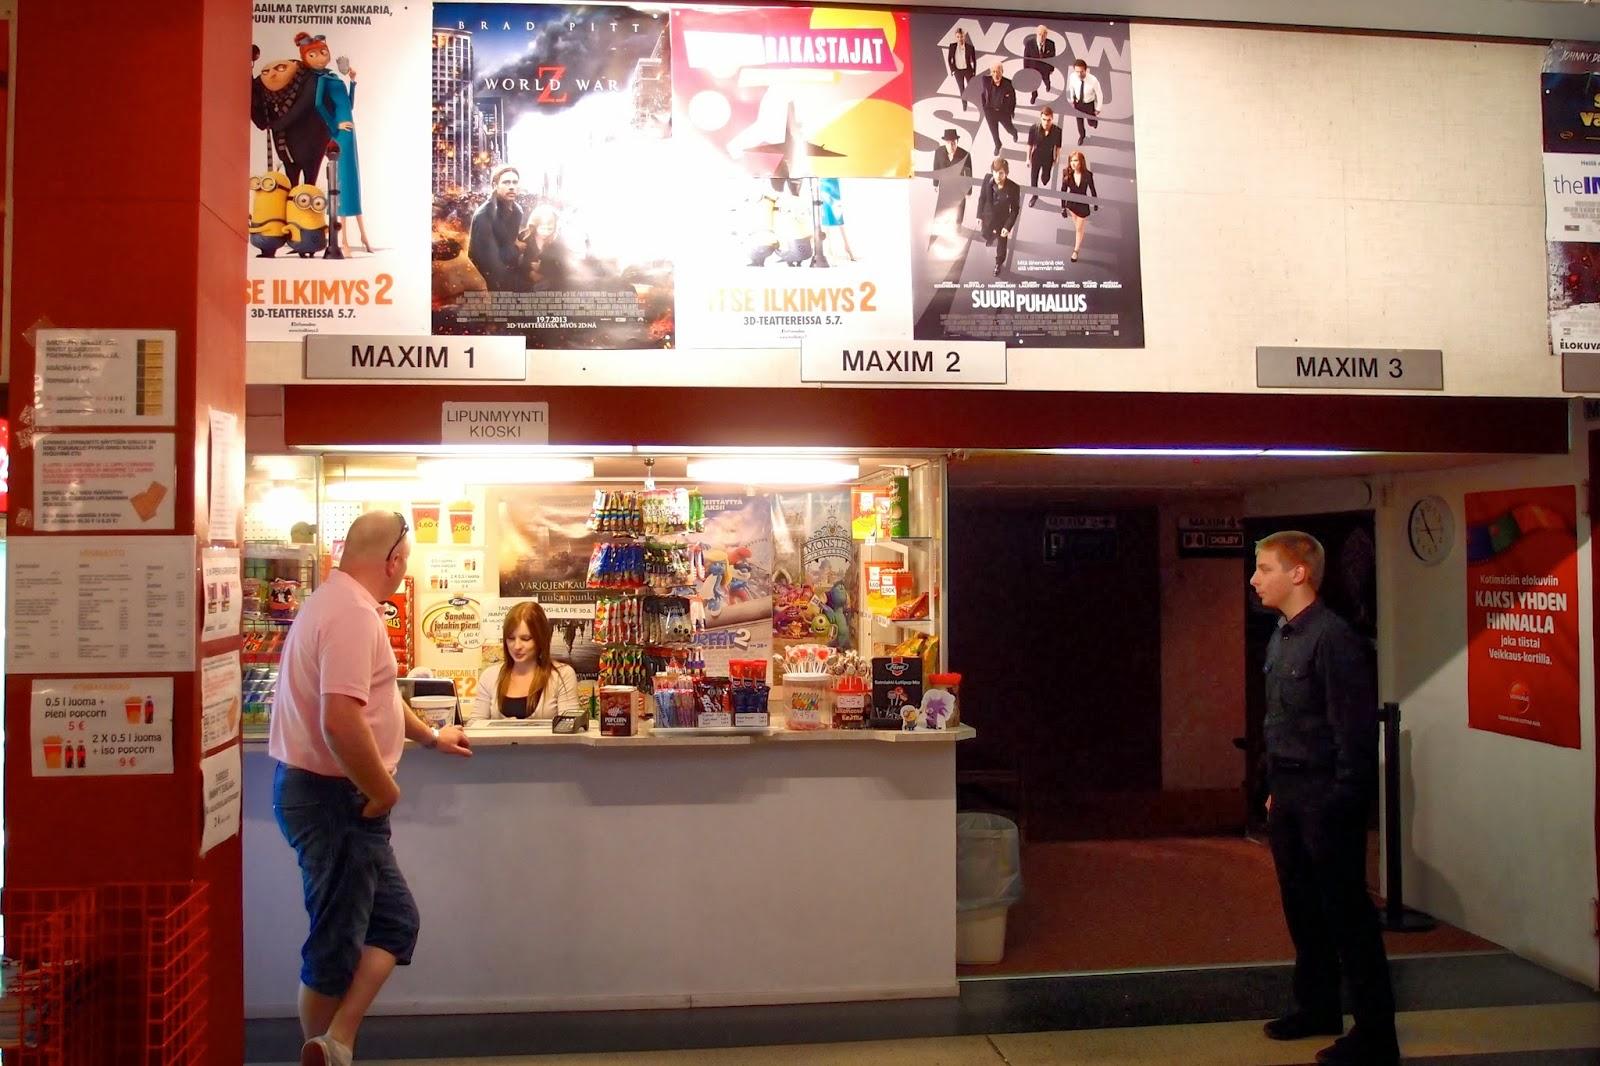 elokuvateatteri marilyn seinäjoki monstercocks